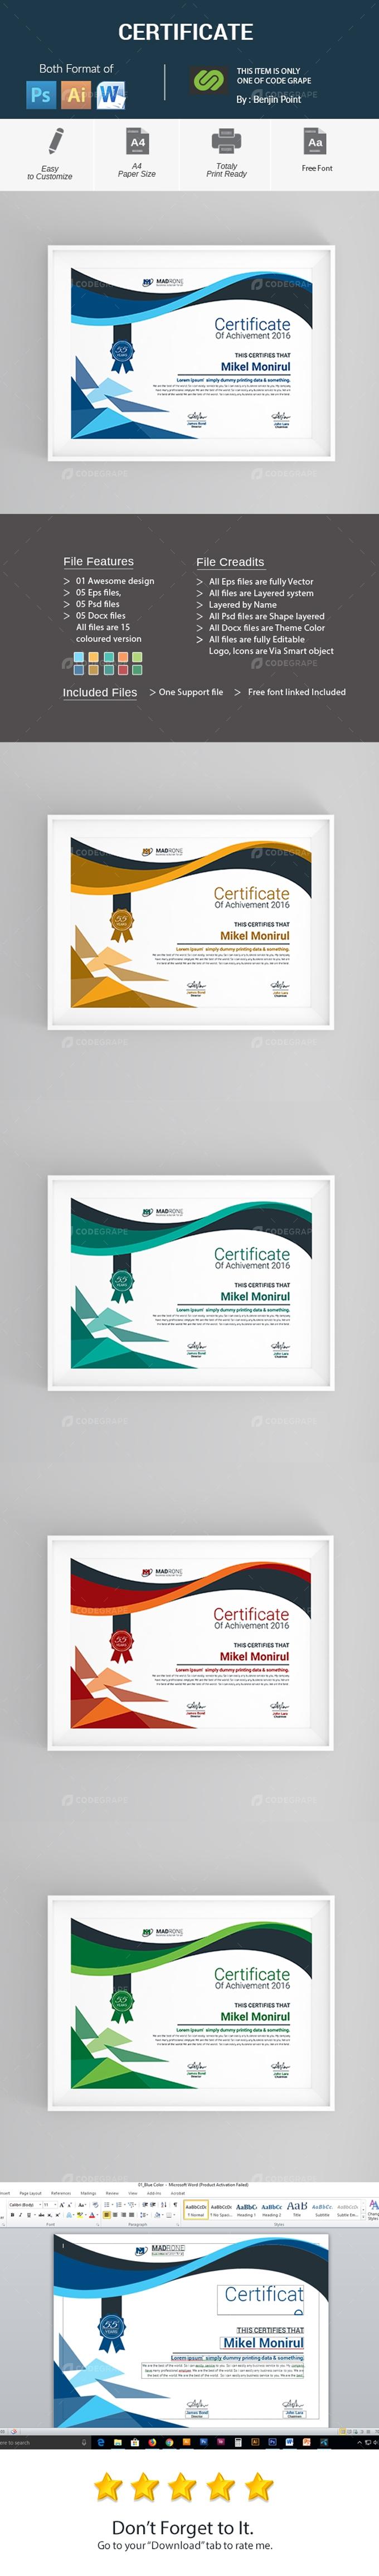 Achivement Certificate